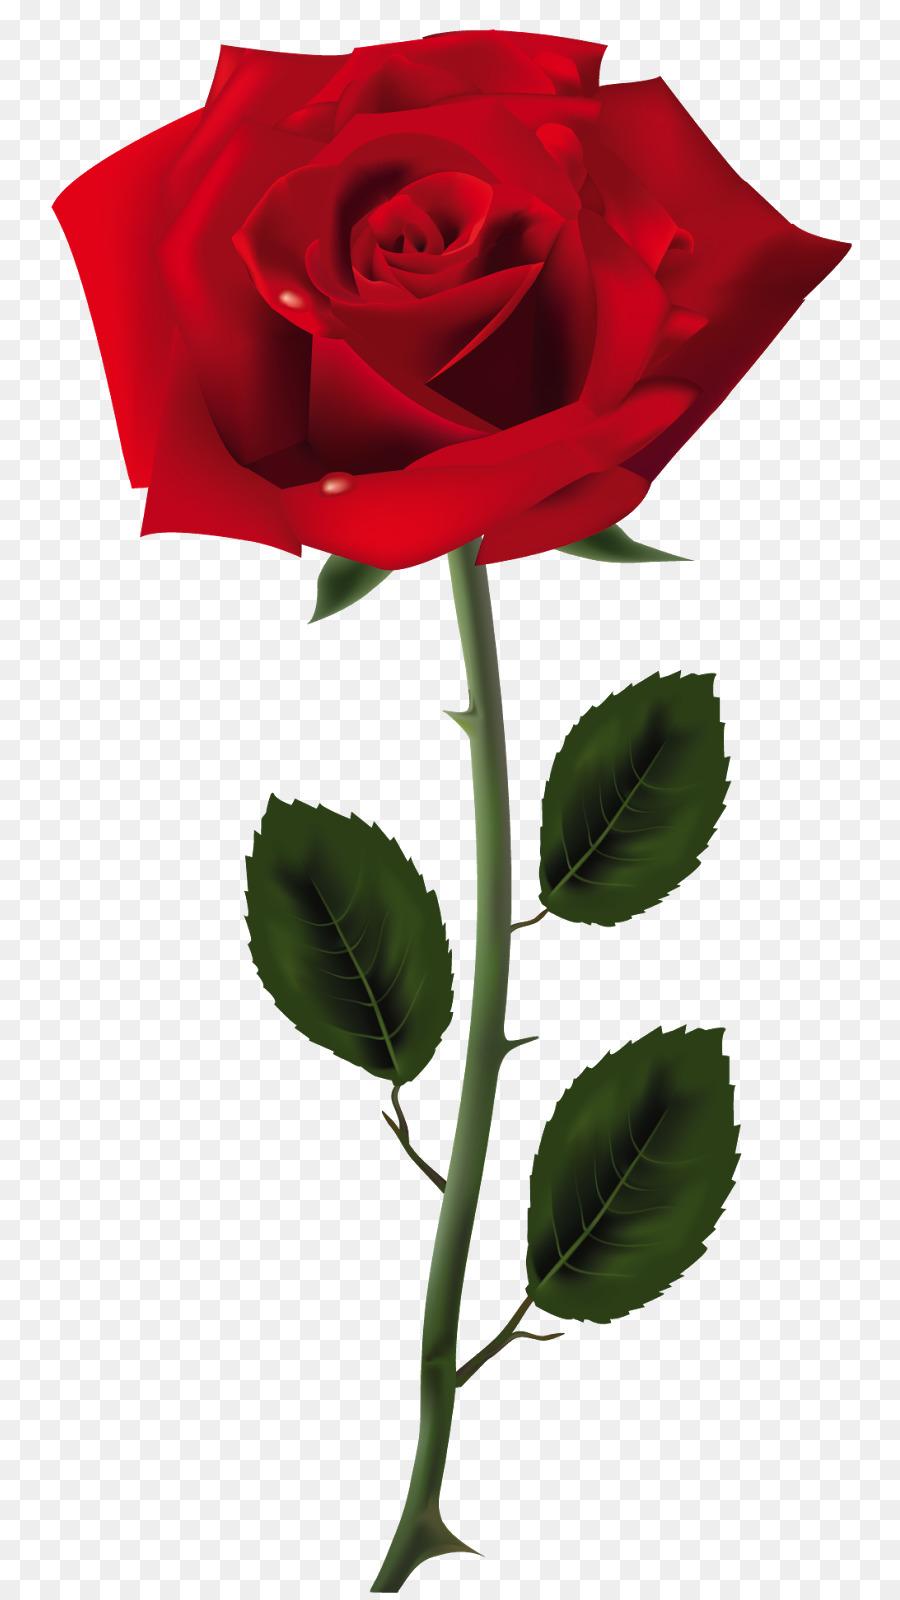 Картинка роза красная на прозрачном фоне